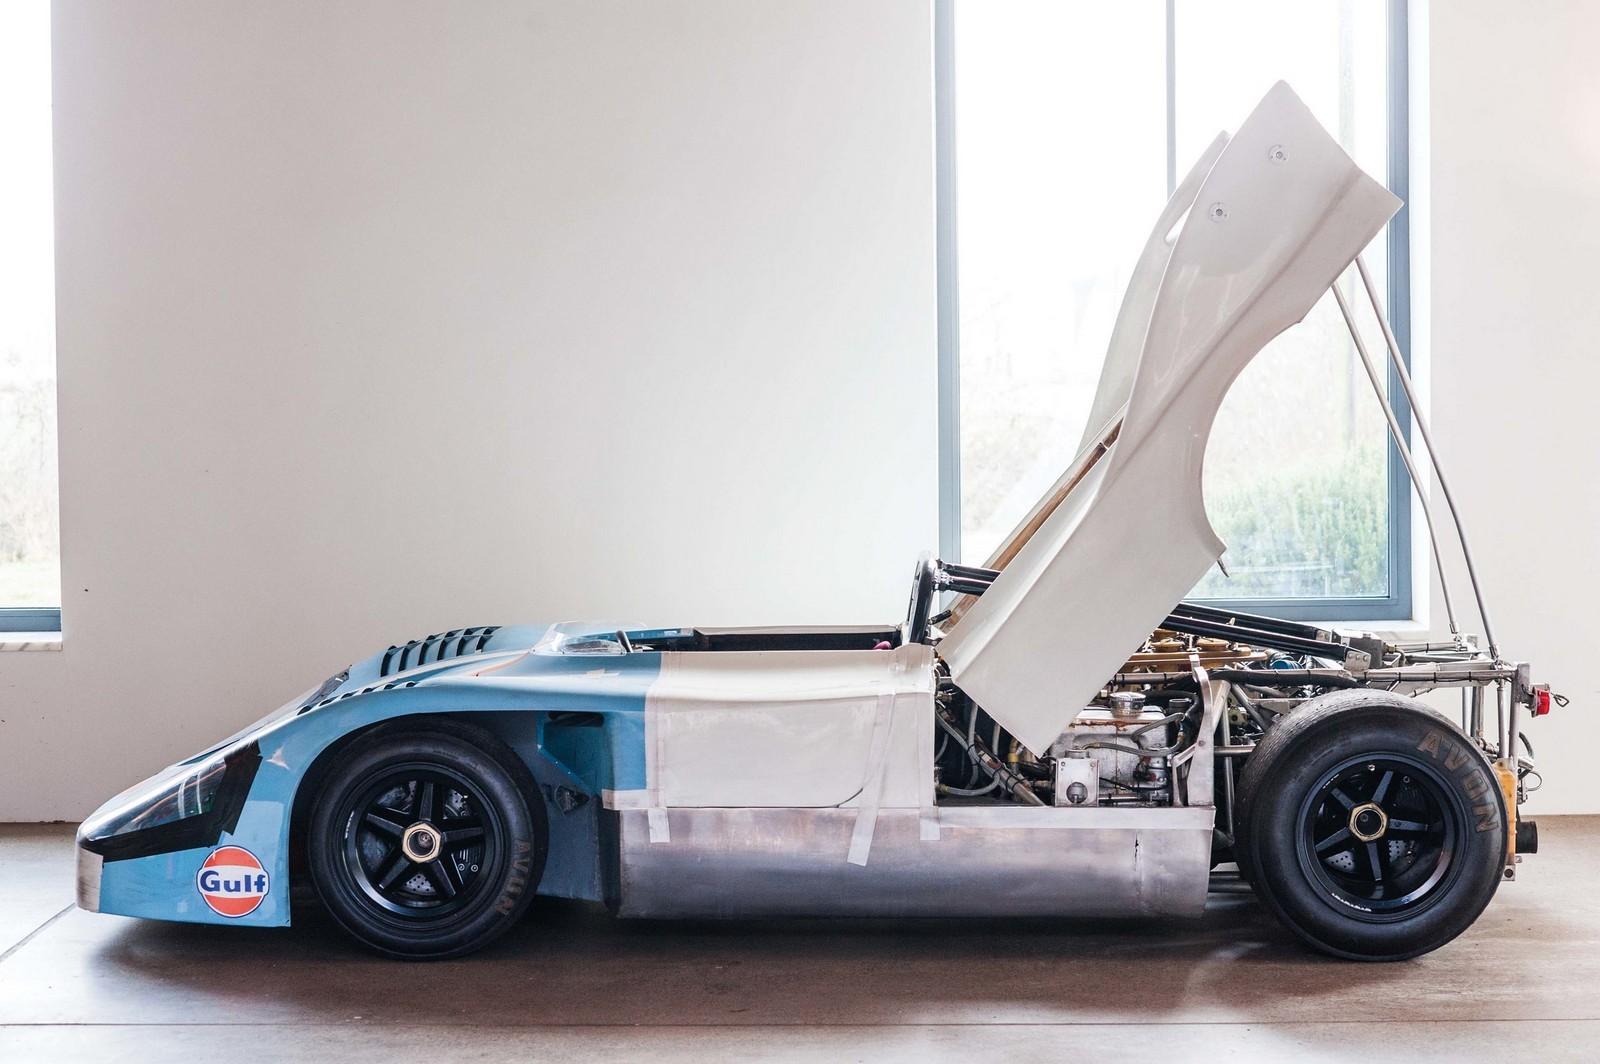 Prototipo Porsche 917/10 Spyder